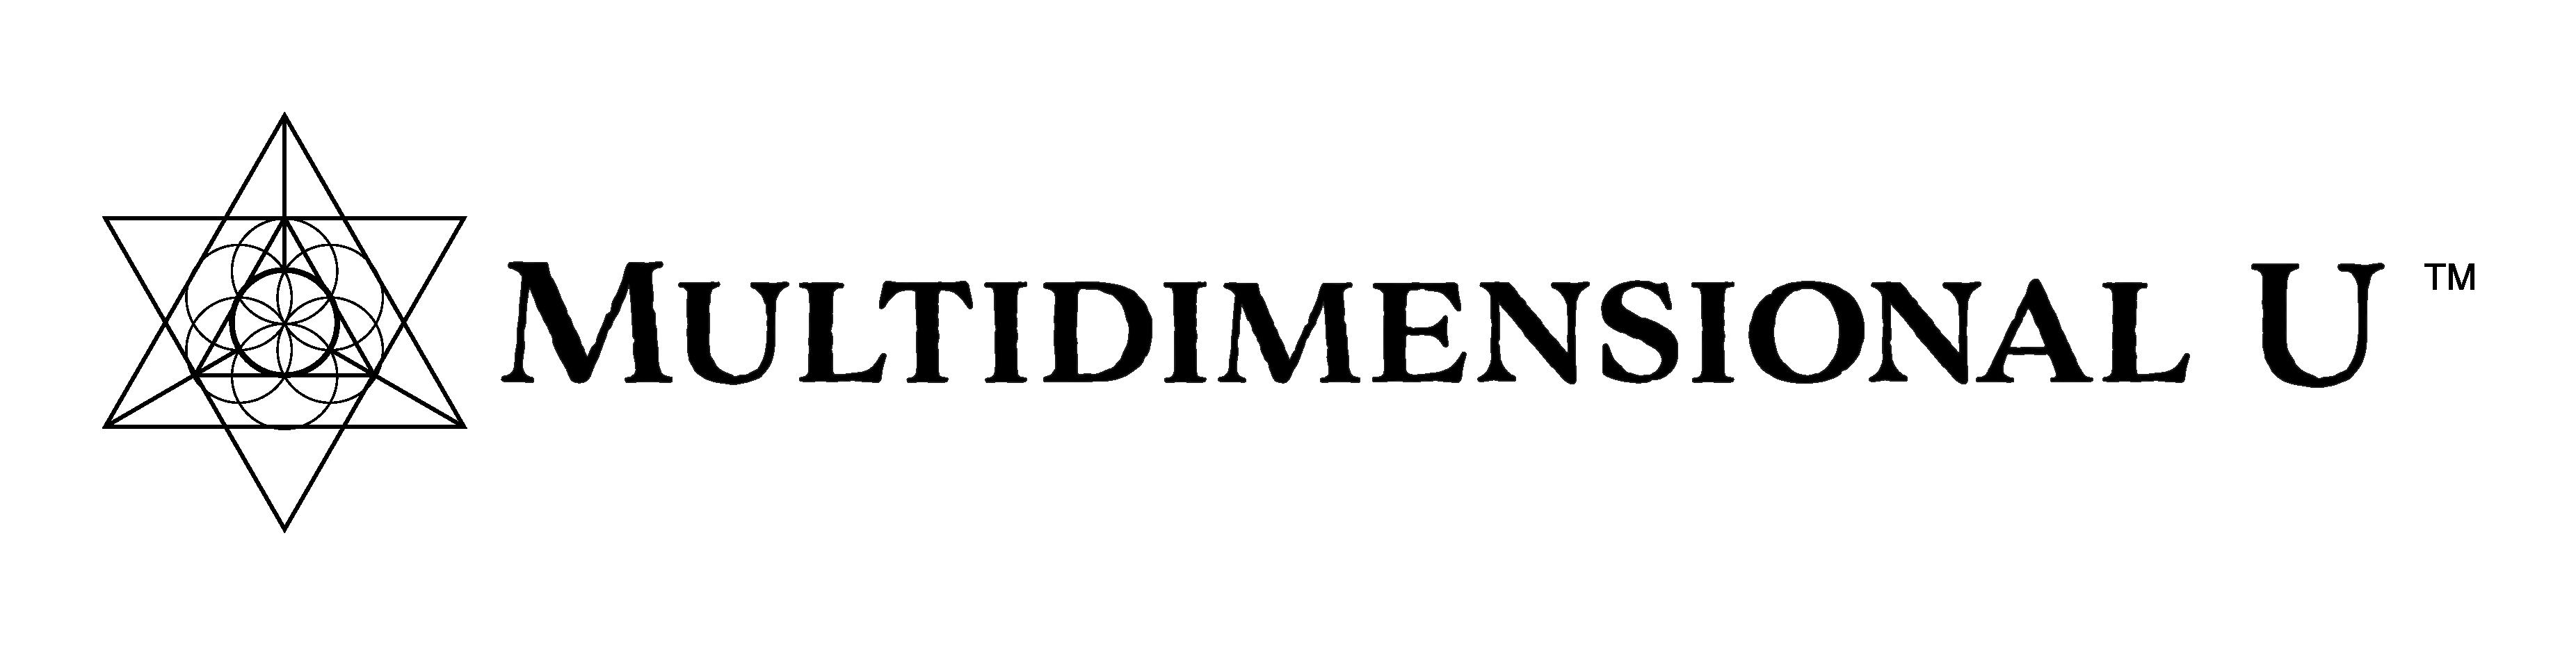 Multidimensional U®    Logo